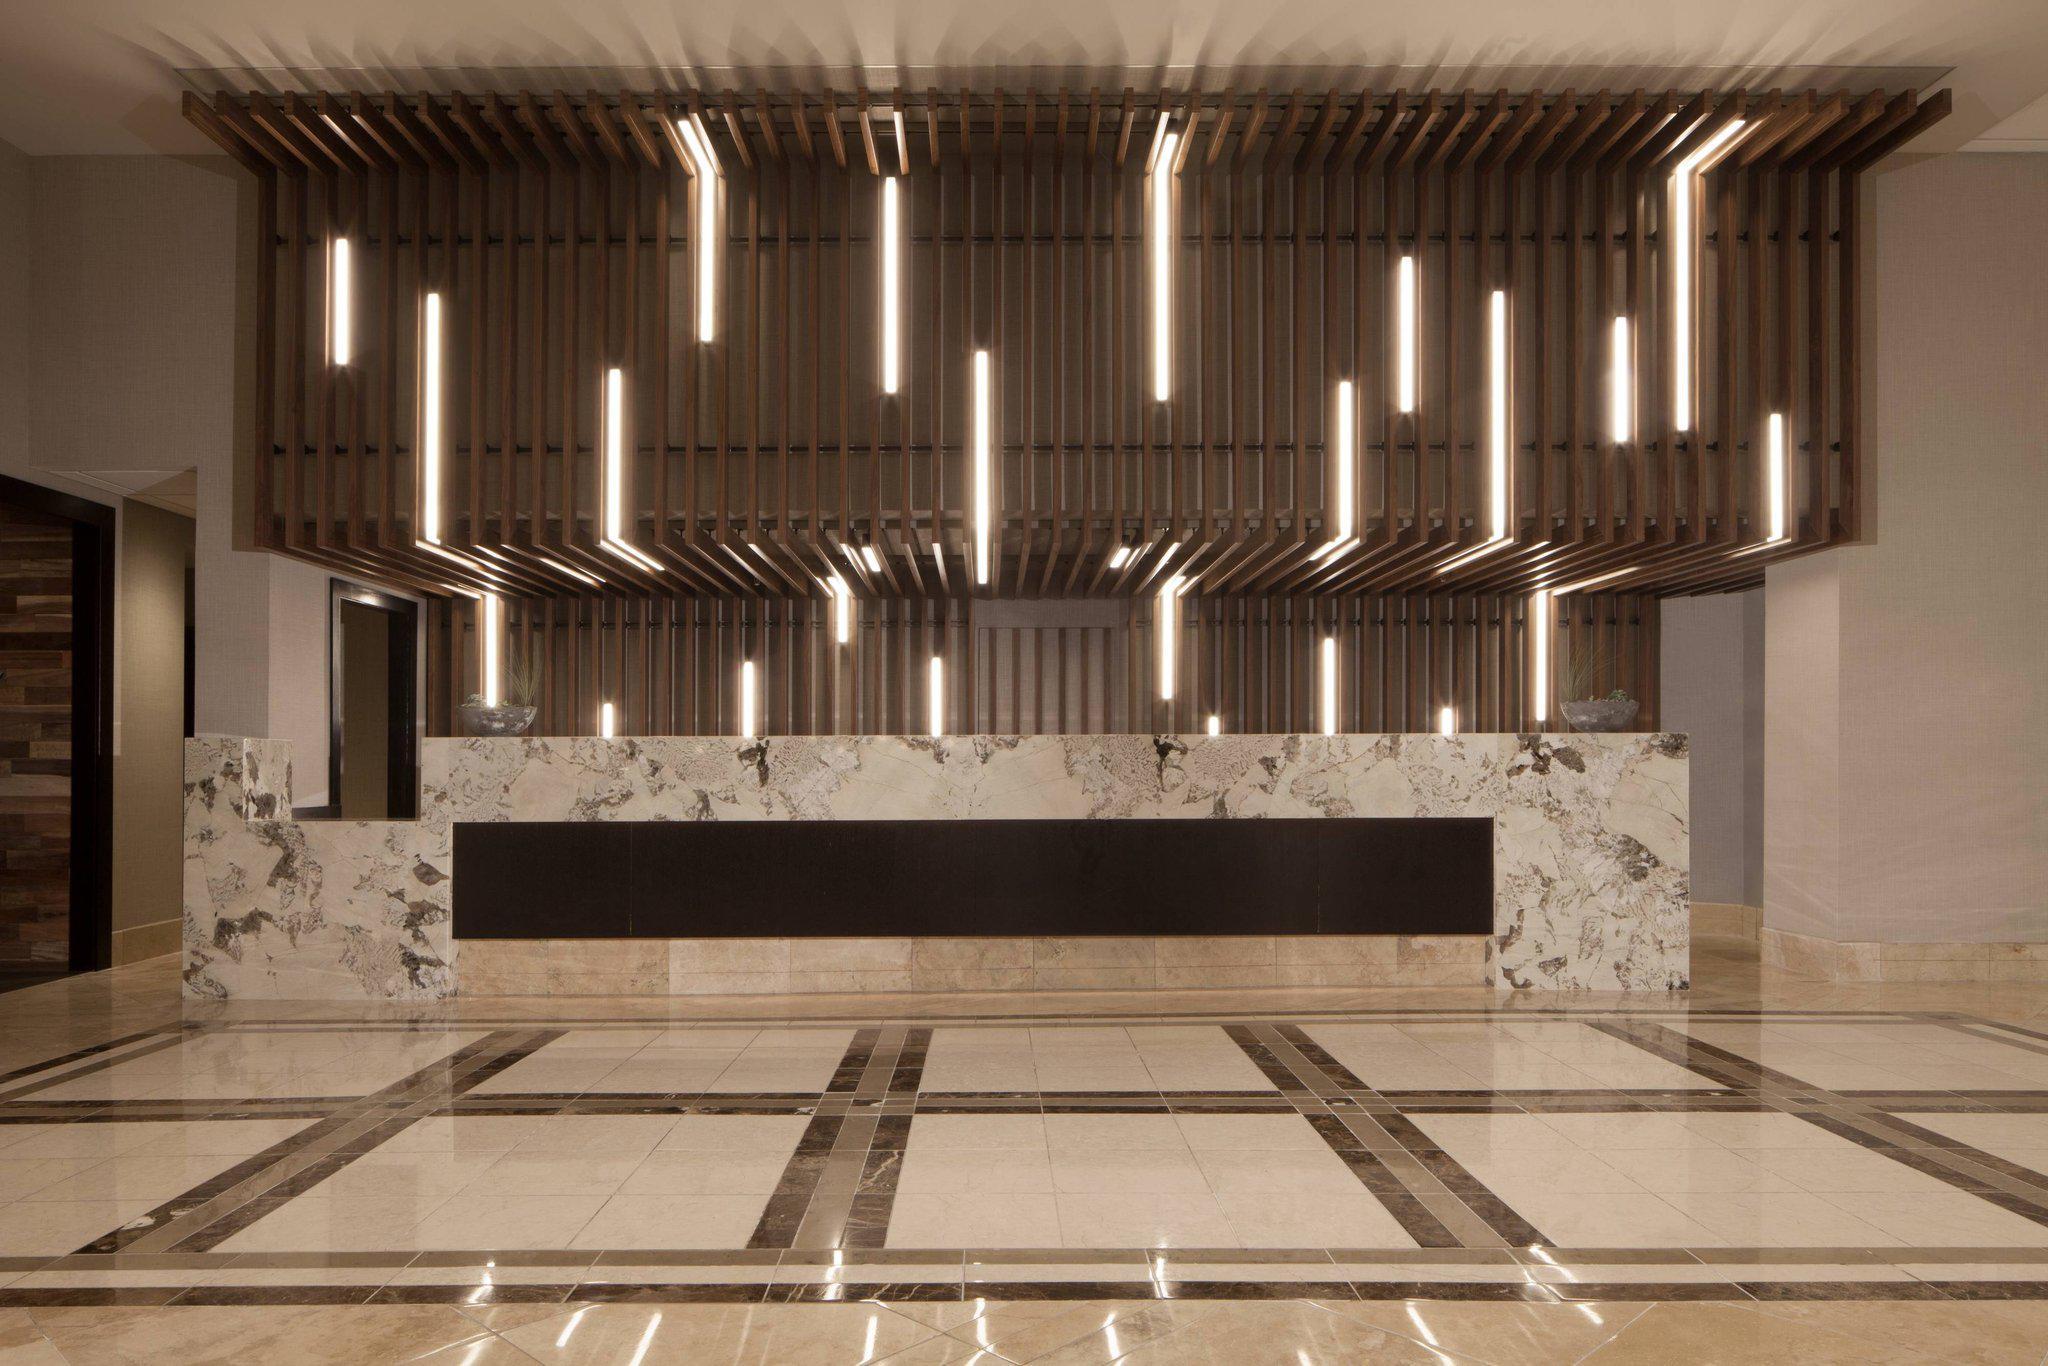 Dallas/Fort Worth Airport Marriott